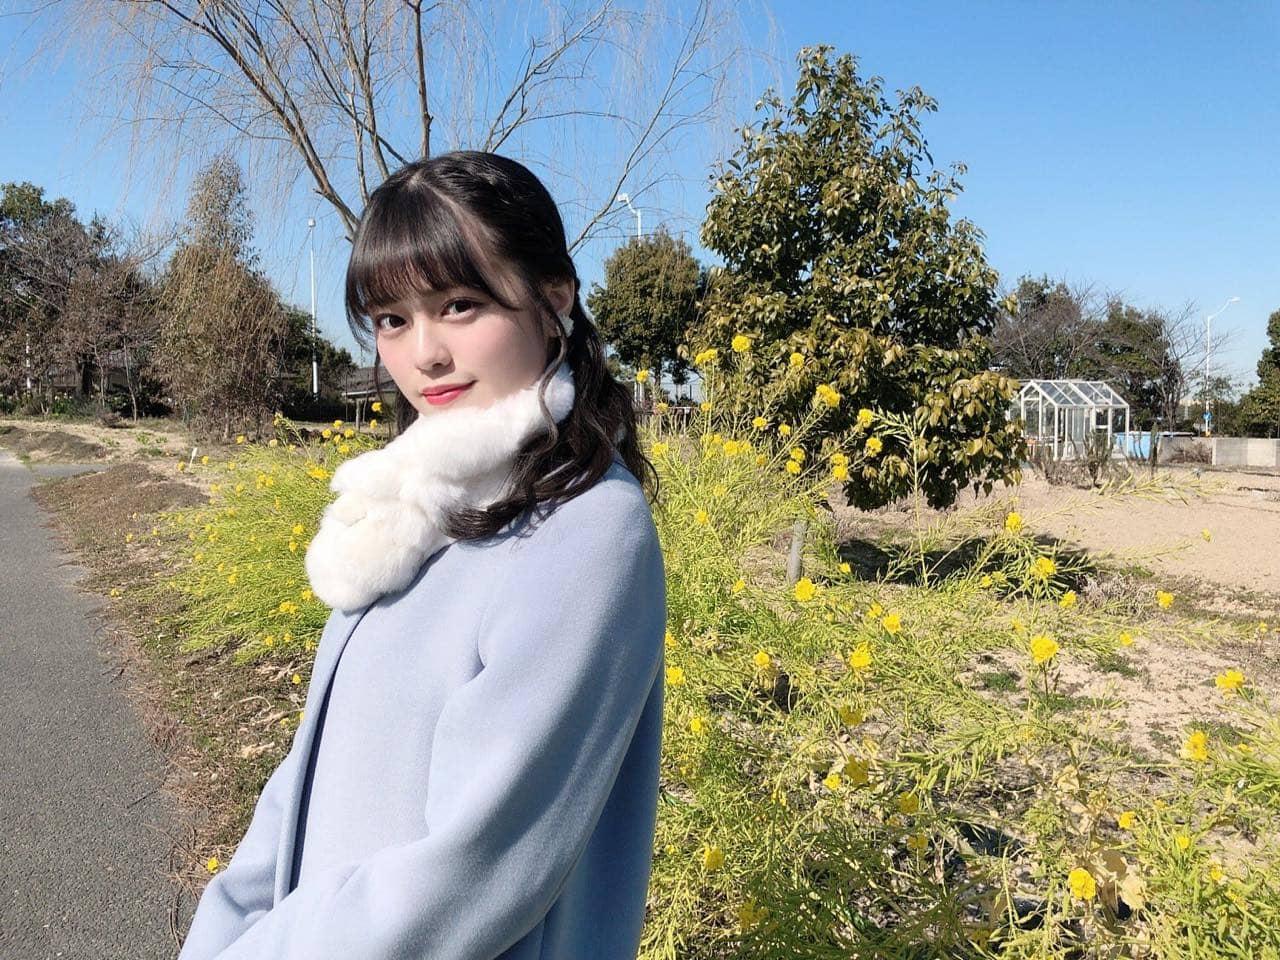 「SKE48のあいちテル!」竹内彩姫があいち健康の森薬草園を紹介!